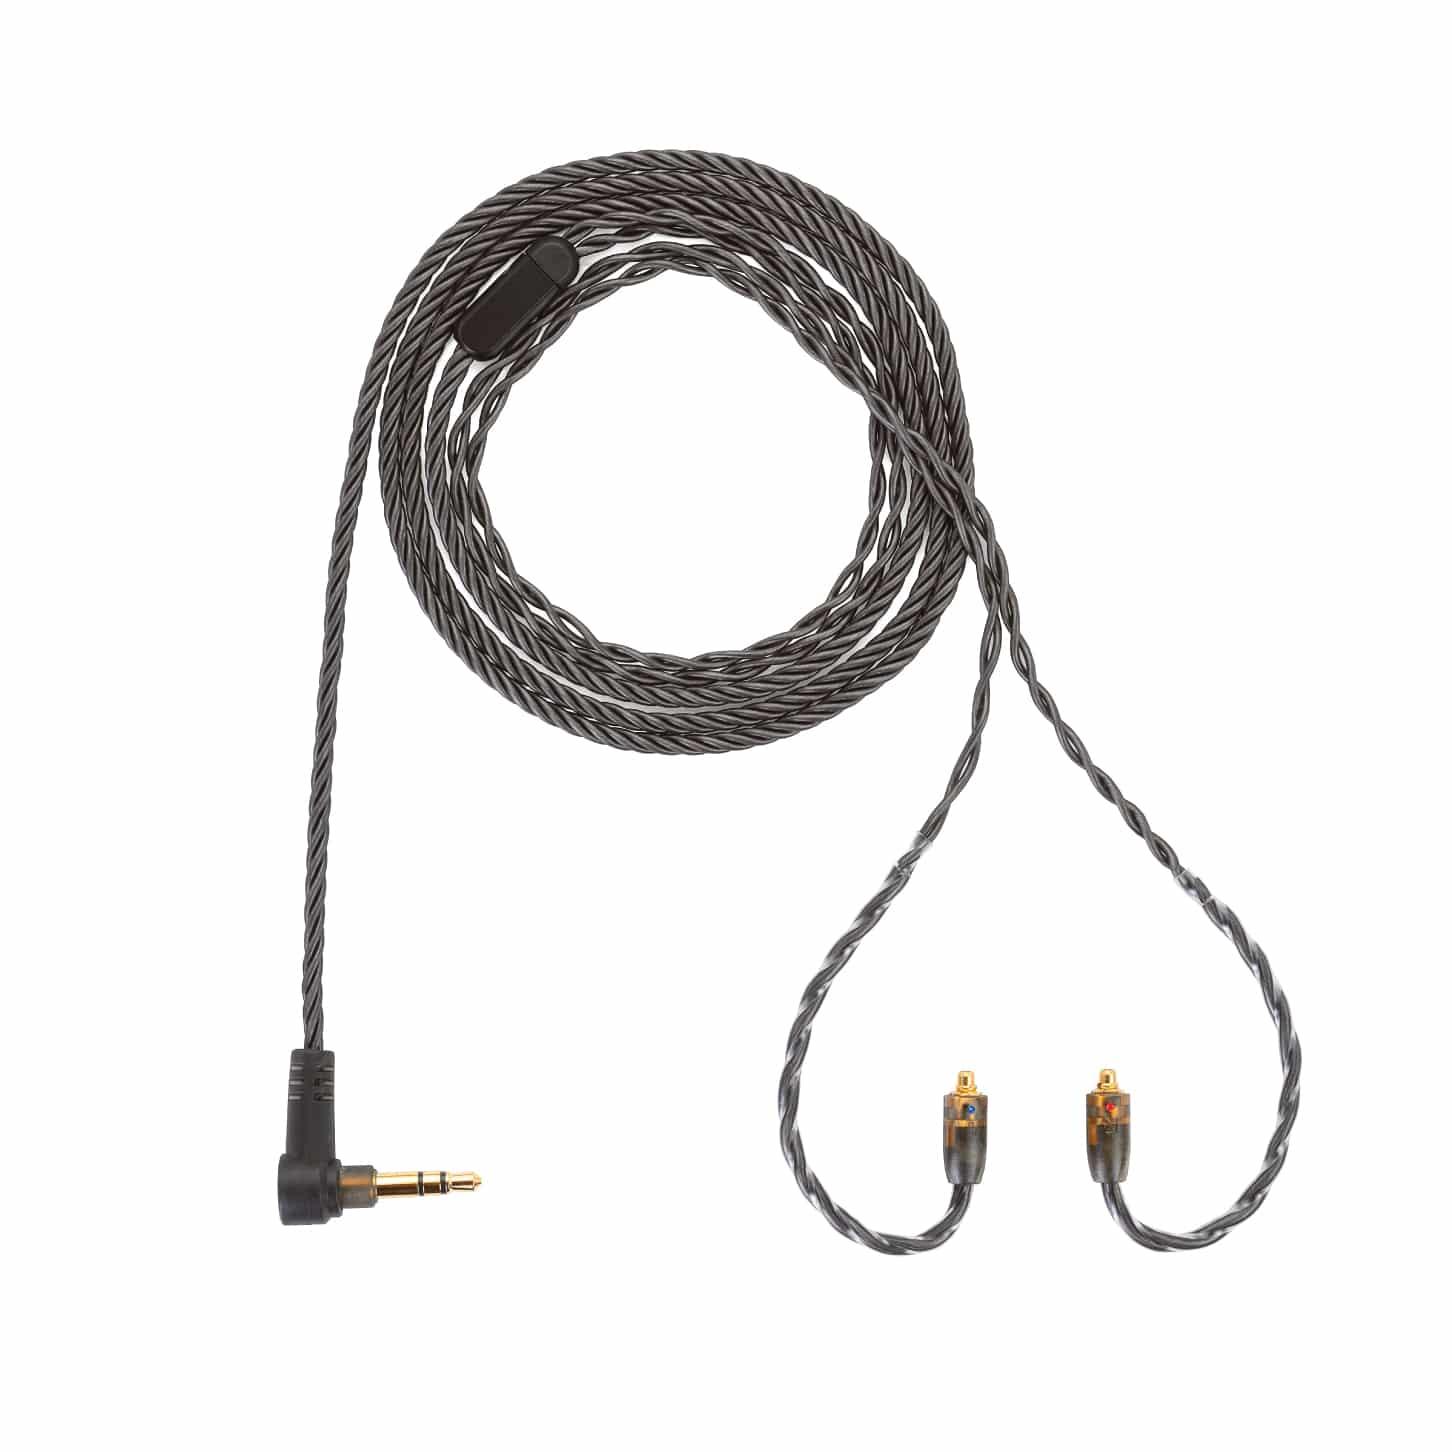 Super Smoky Litz Cable Campfire Audio